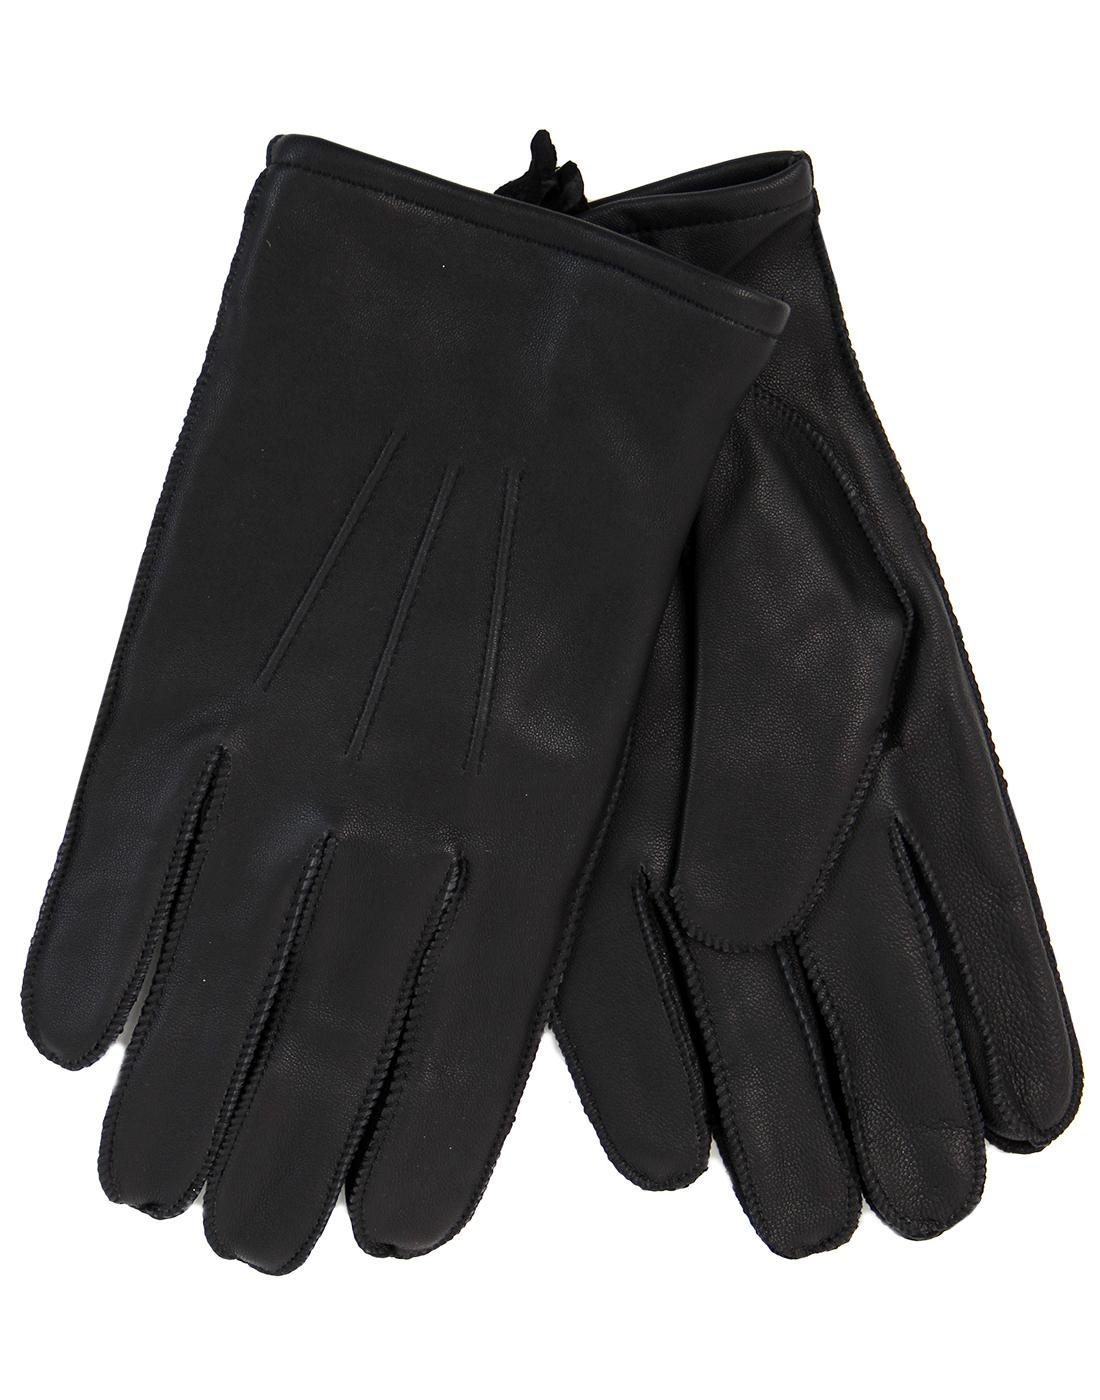 GIBSON LONDON Men's Retro Black Leather Gloves